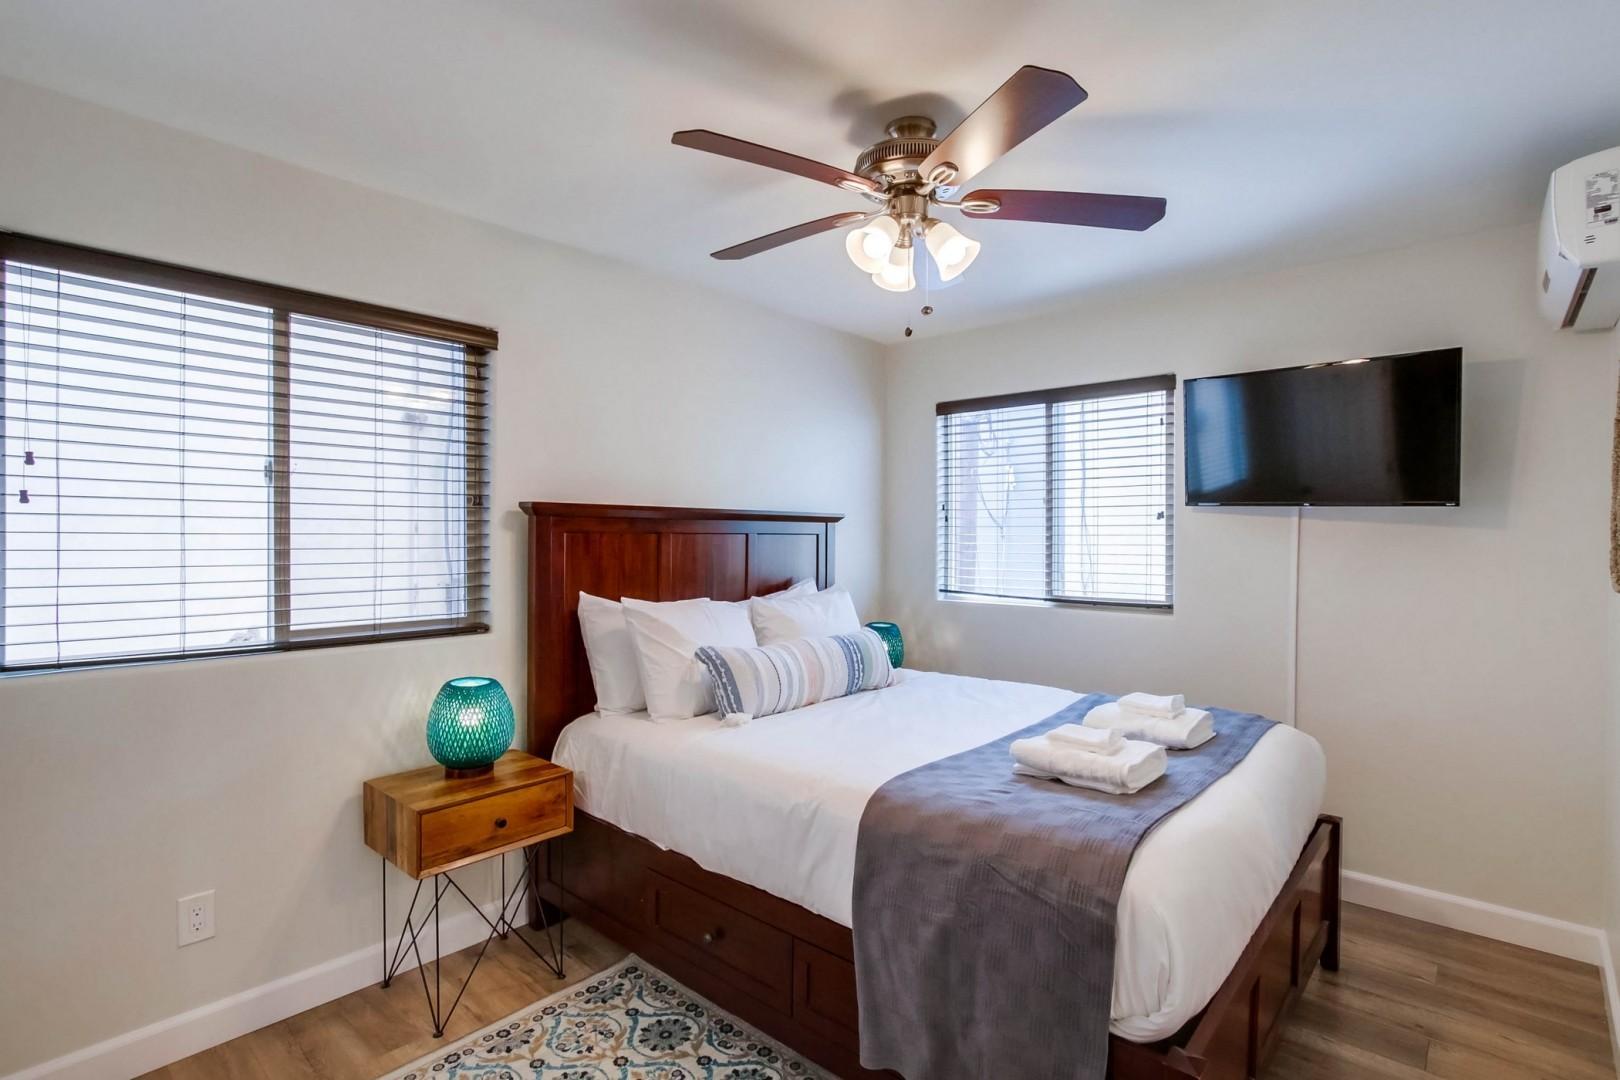 Bedroom 4 with a queen bed